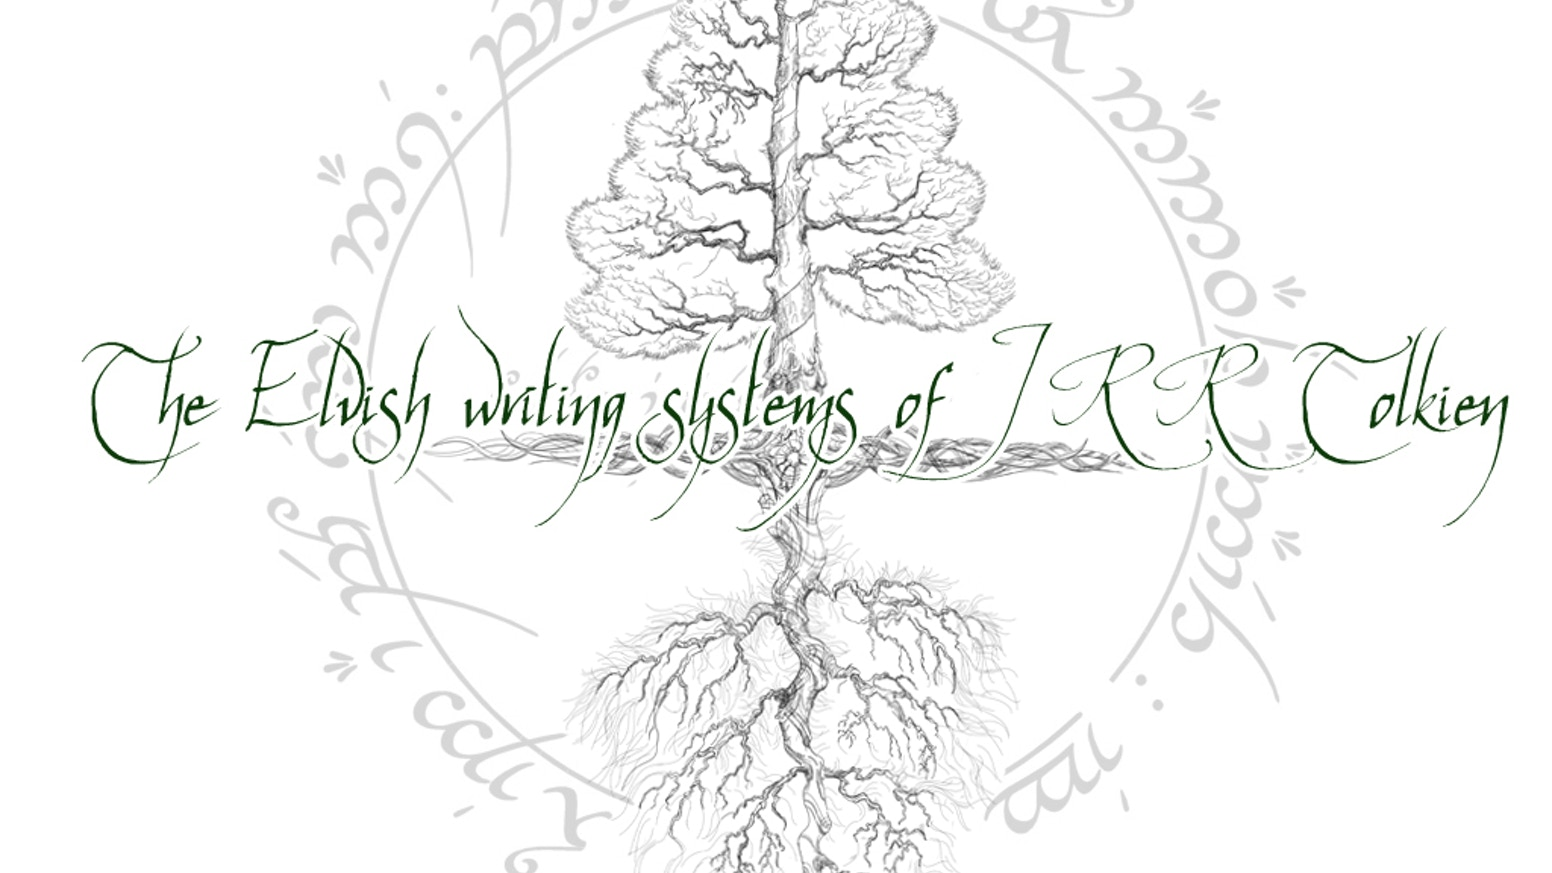 The Elvish Writing Systems of J.R.R. Tolkien by Matt